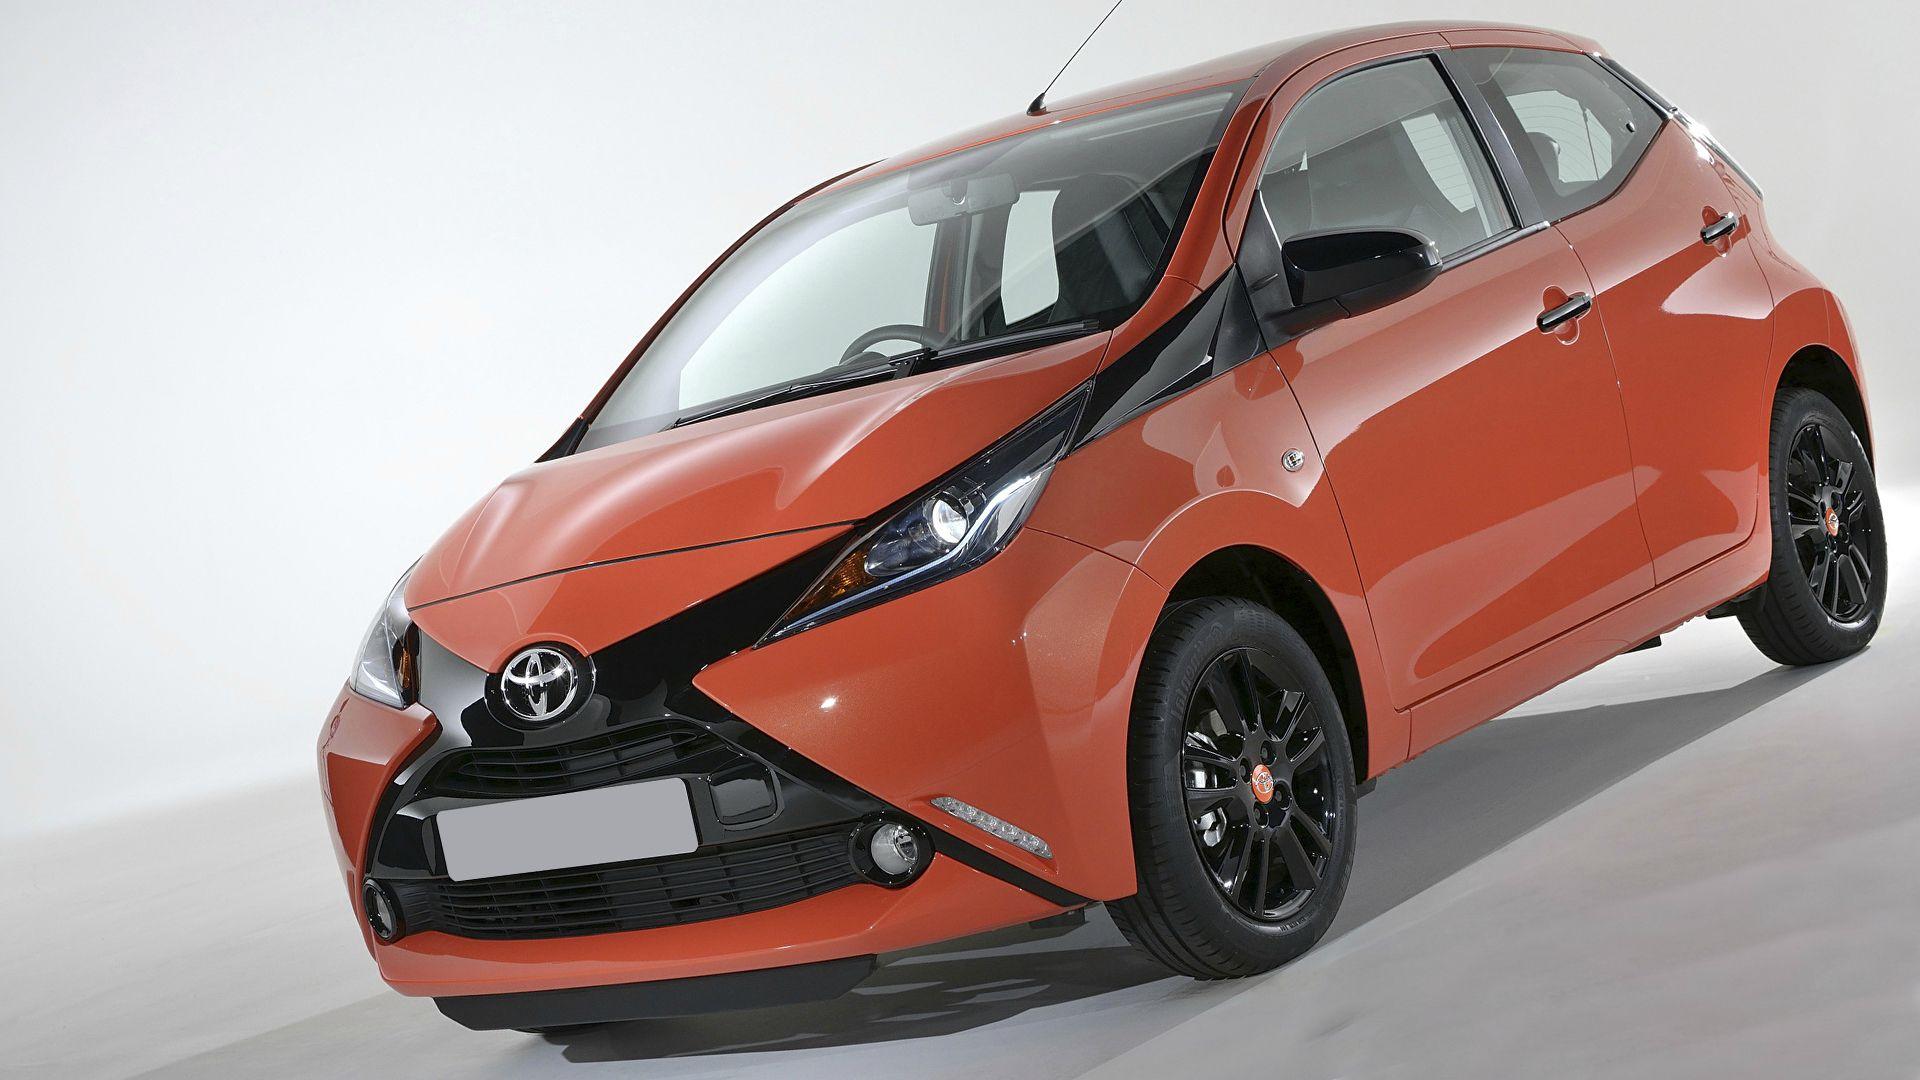 New 2019 Toyota Aygo Price